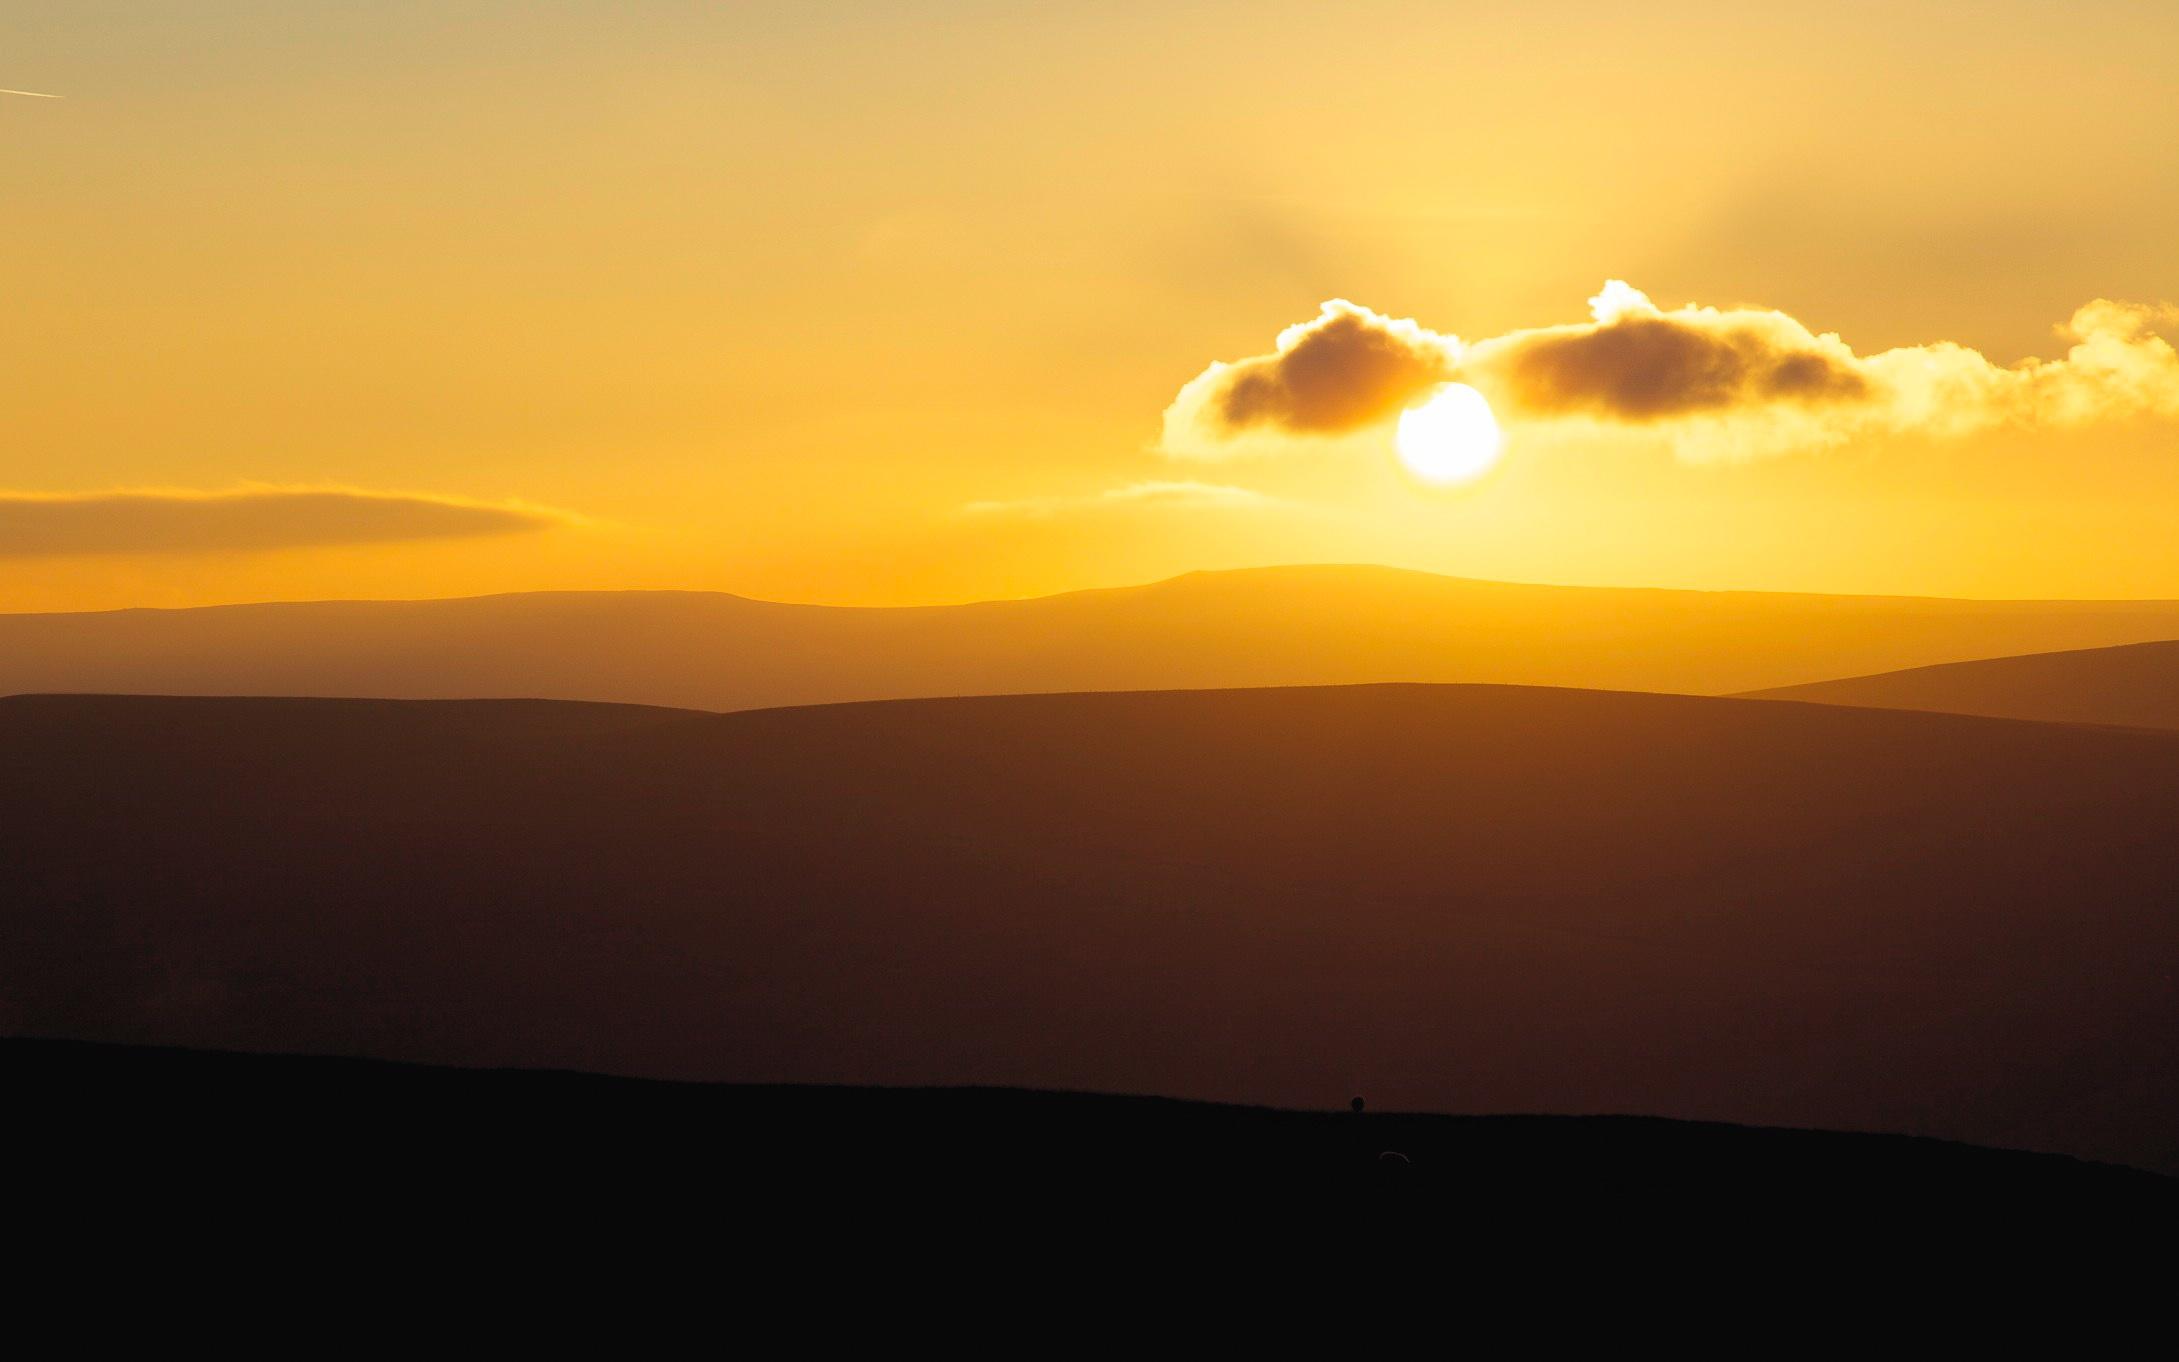 Sunset at Tan Hill